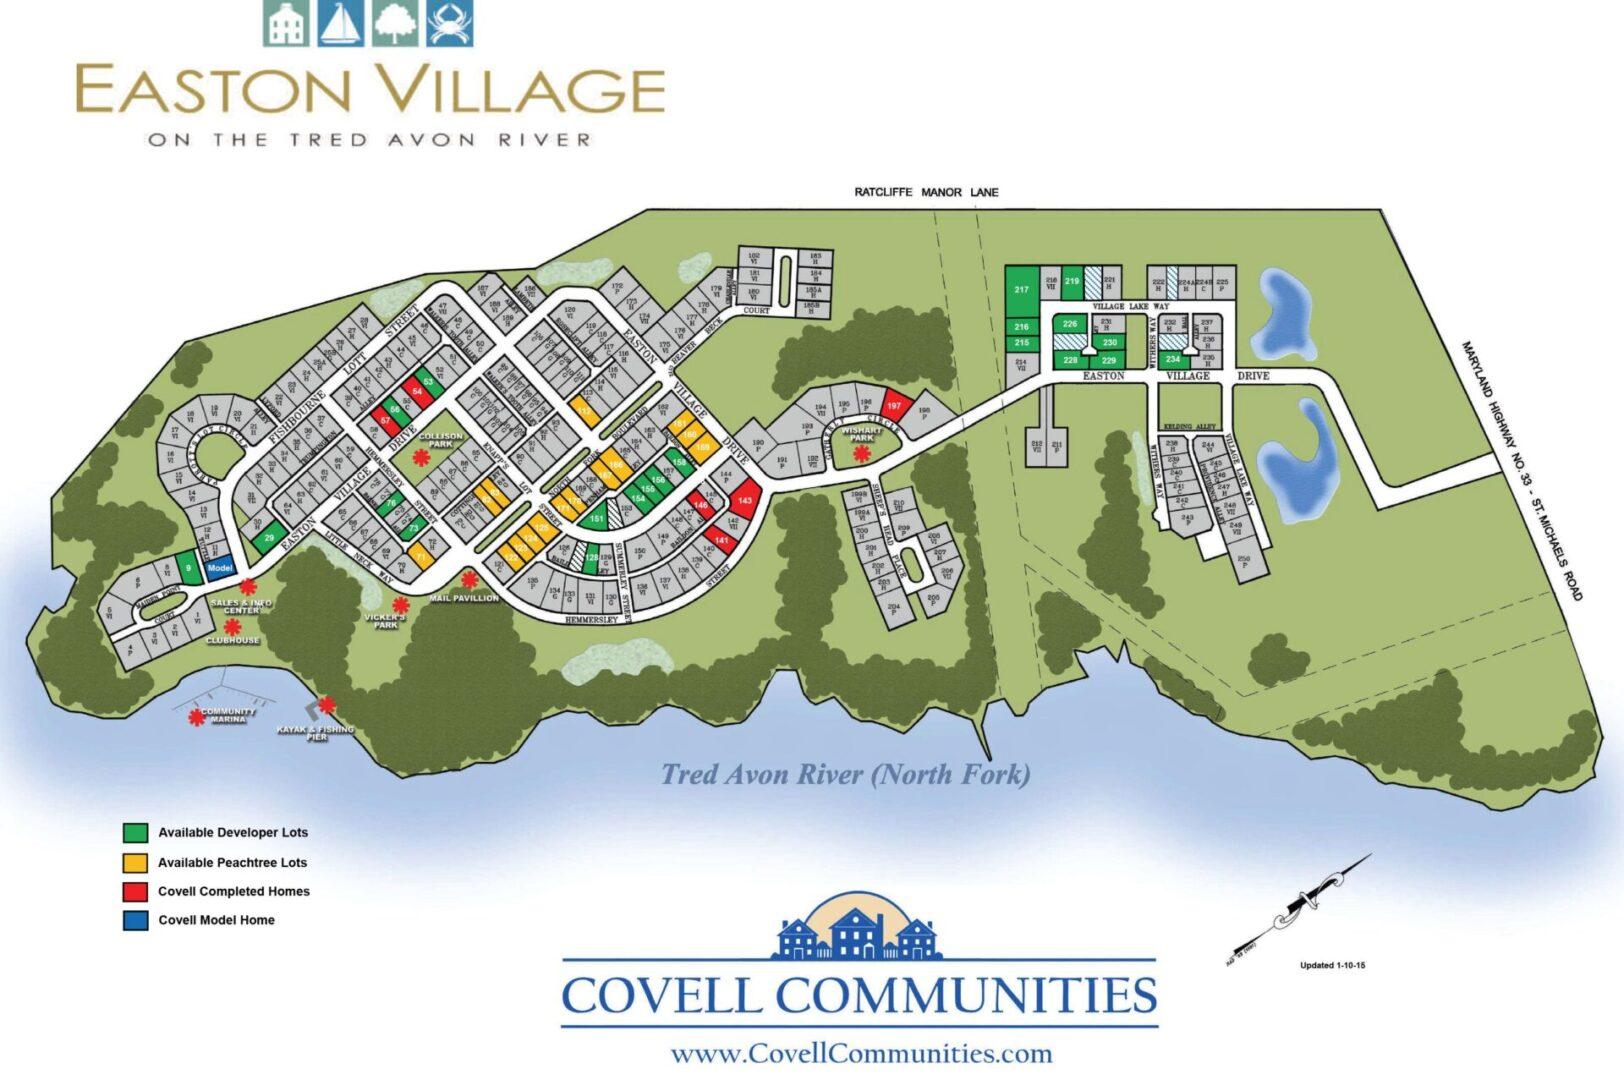 Easton village master plan